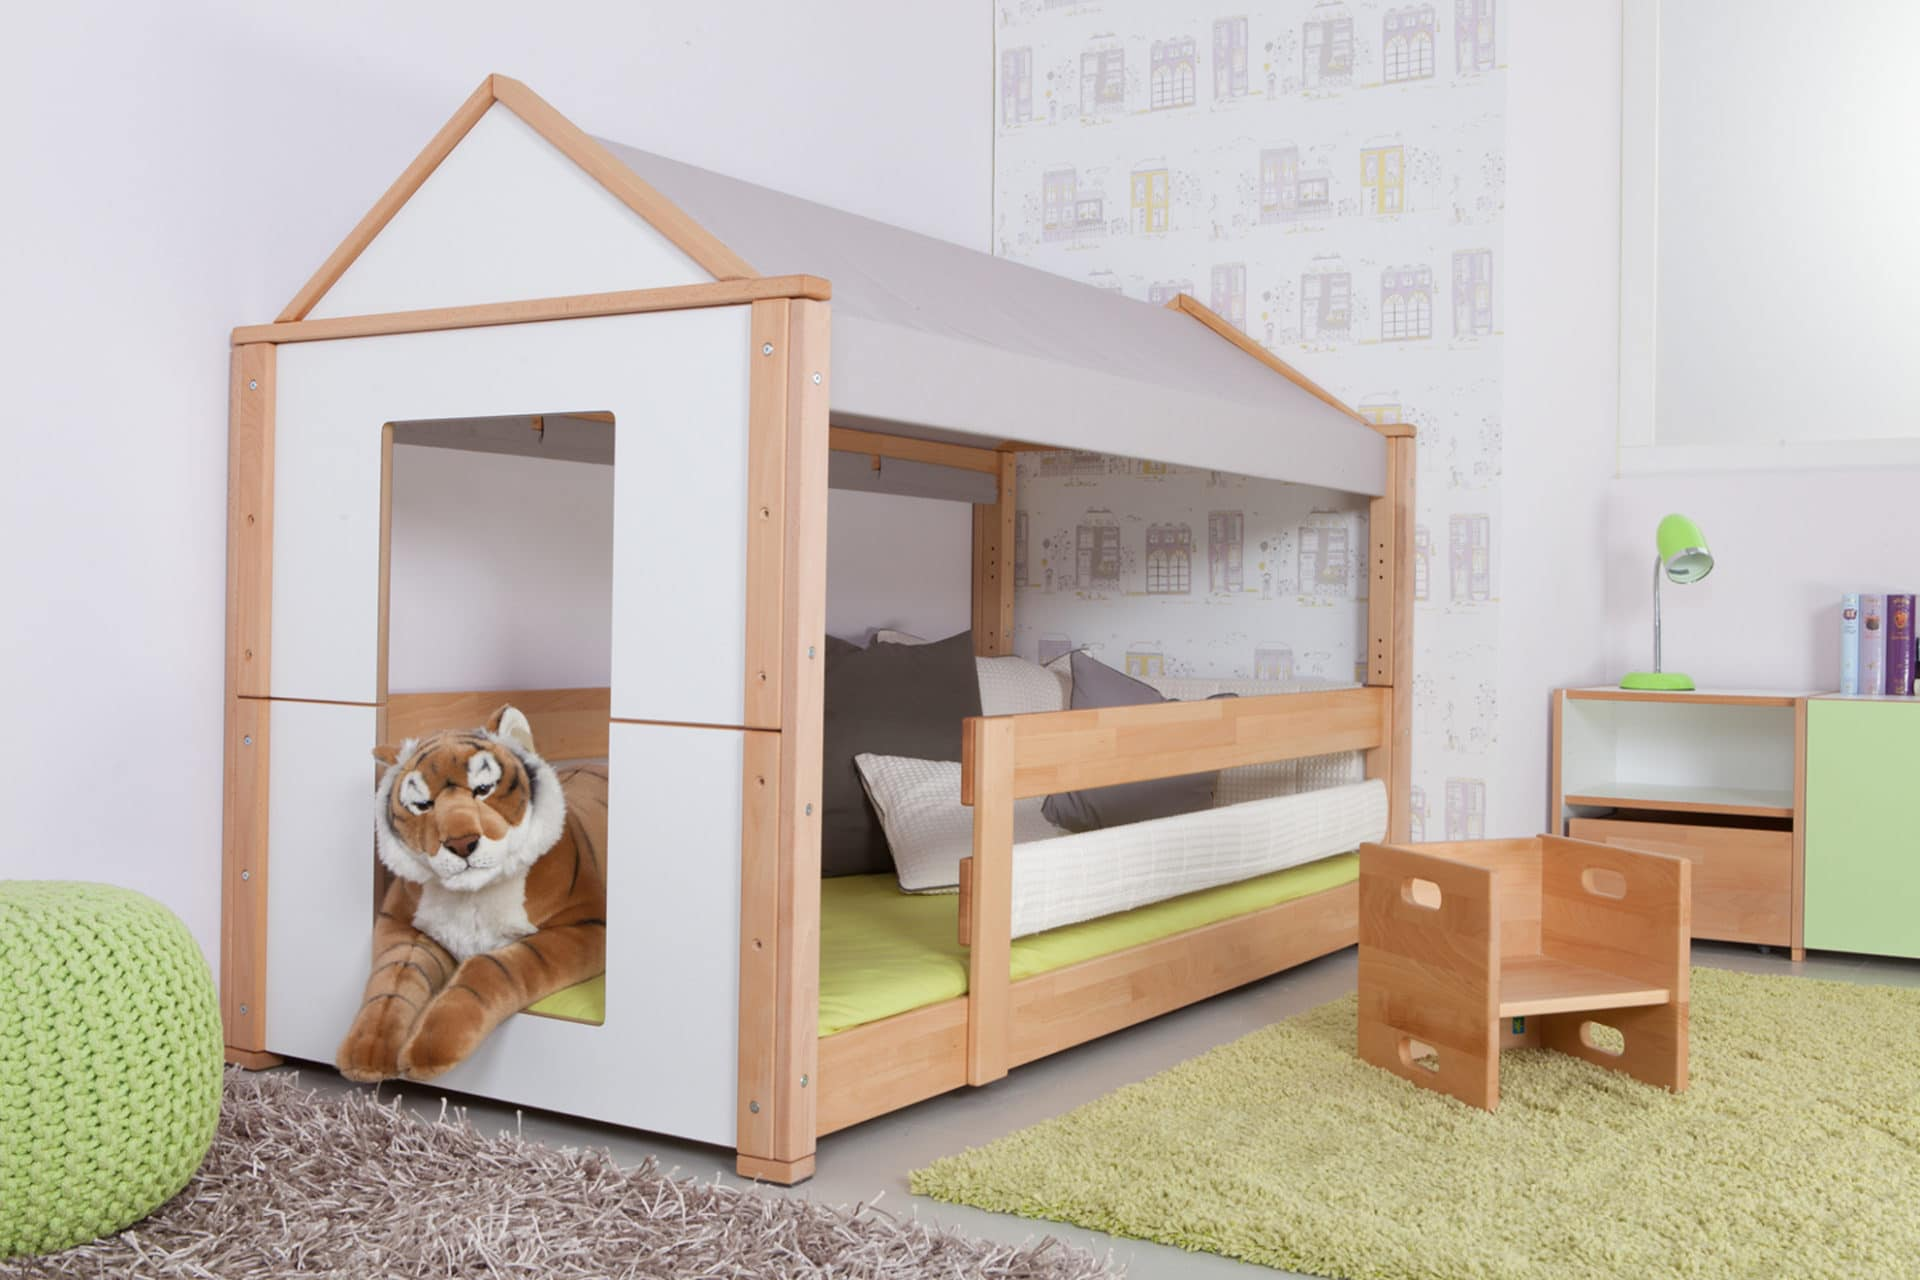 kinderbett spielhaus. Black Bedroom Furniture Sets. Home Design Ideas